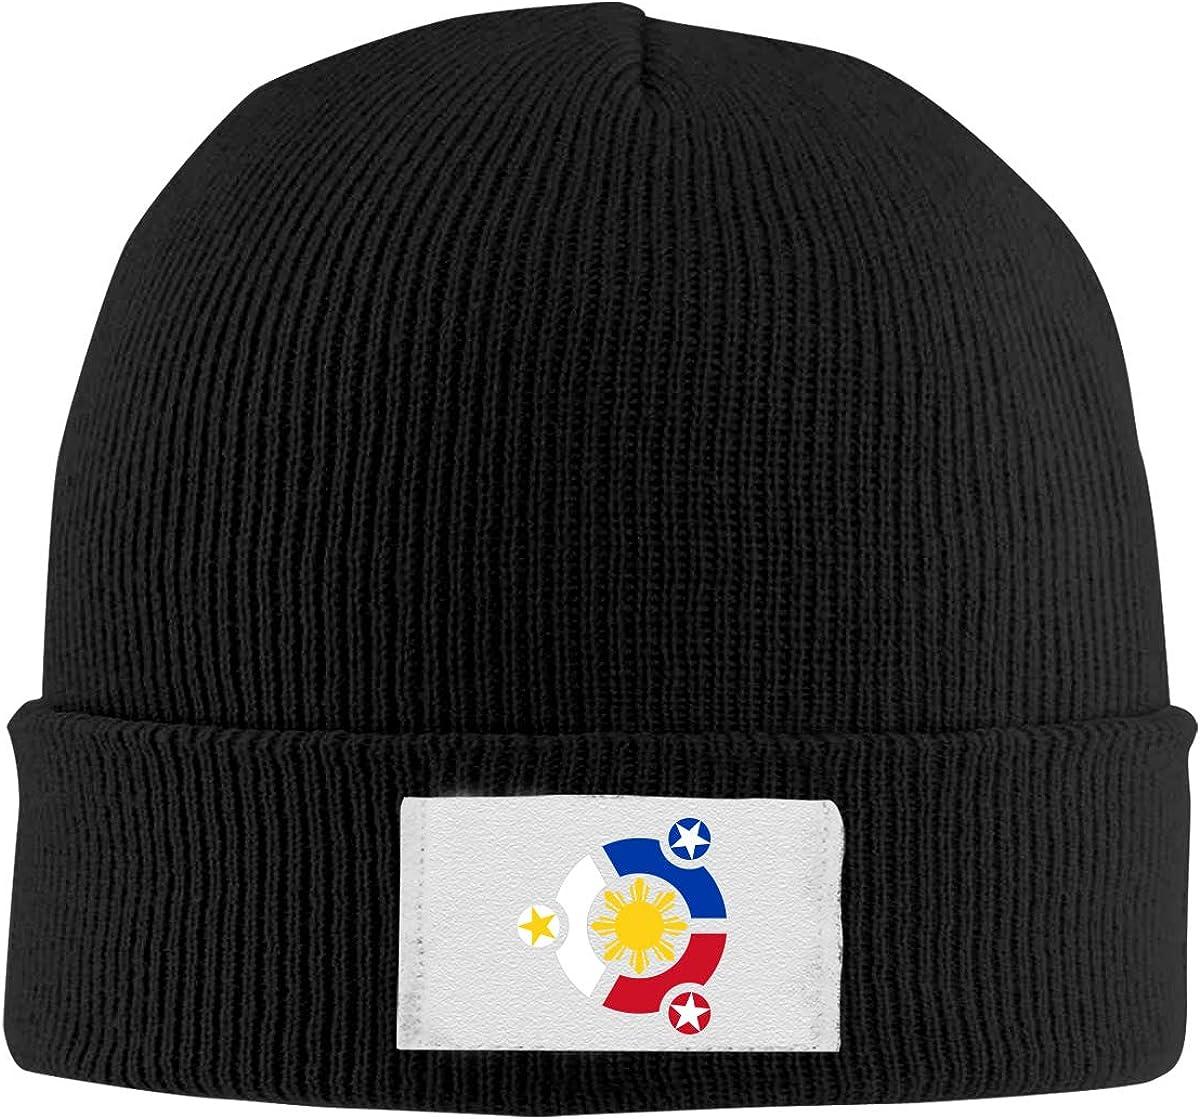 Dunpaiaa Skull Caps Music Winter Warm Knit Hats Stretchy Cuff Beanie Hat Black